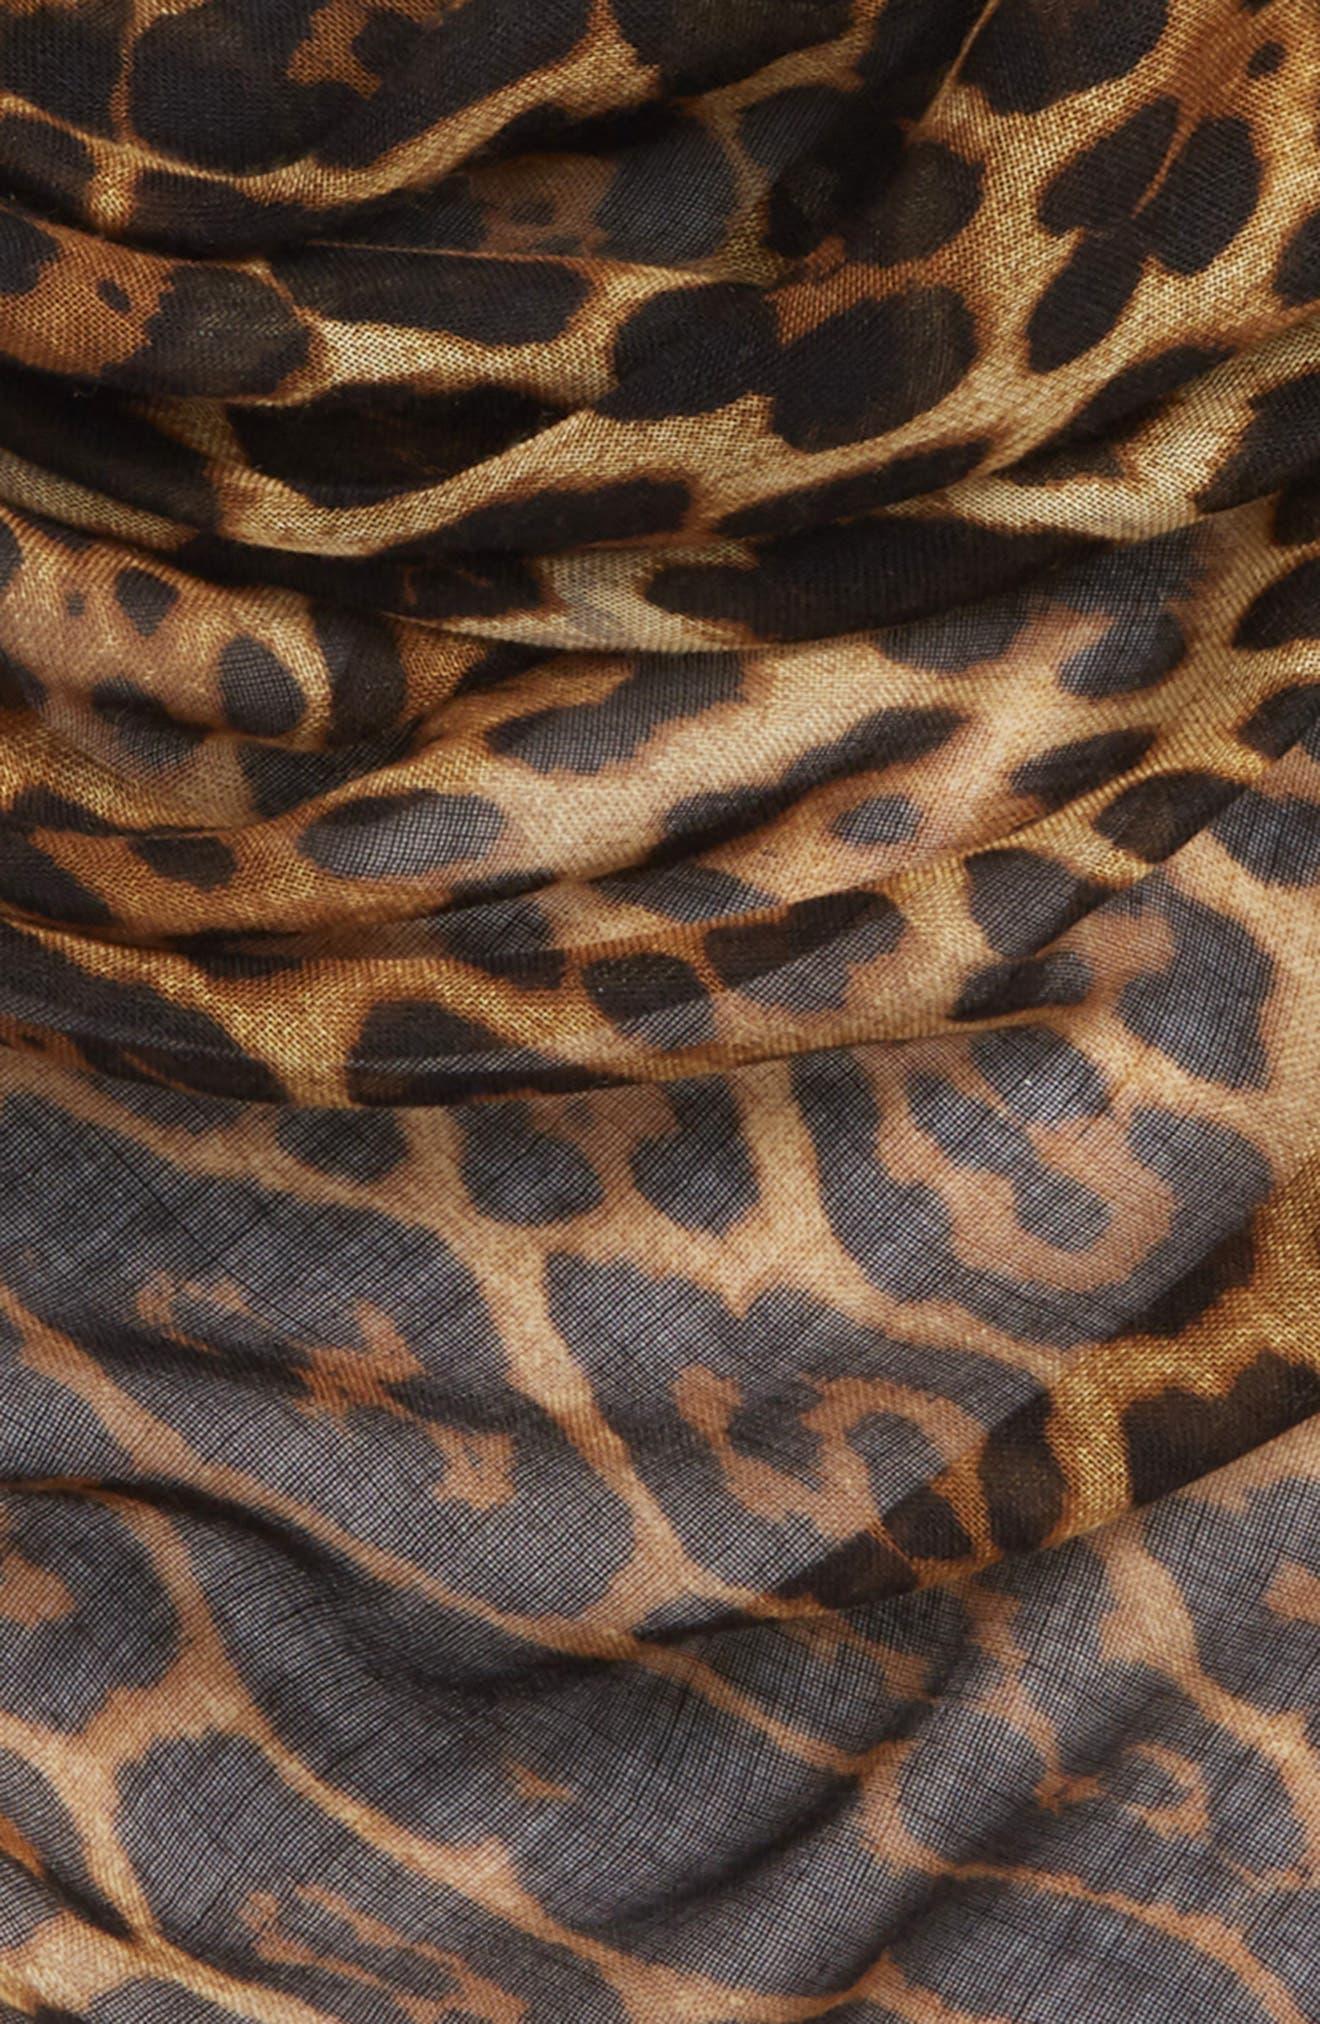 YSL Leopard Print Cashmere & Silk Triangle Scarf,                             Alternate thumbnail 3, color,                             Mahogany/ Black